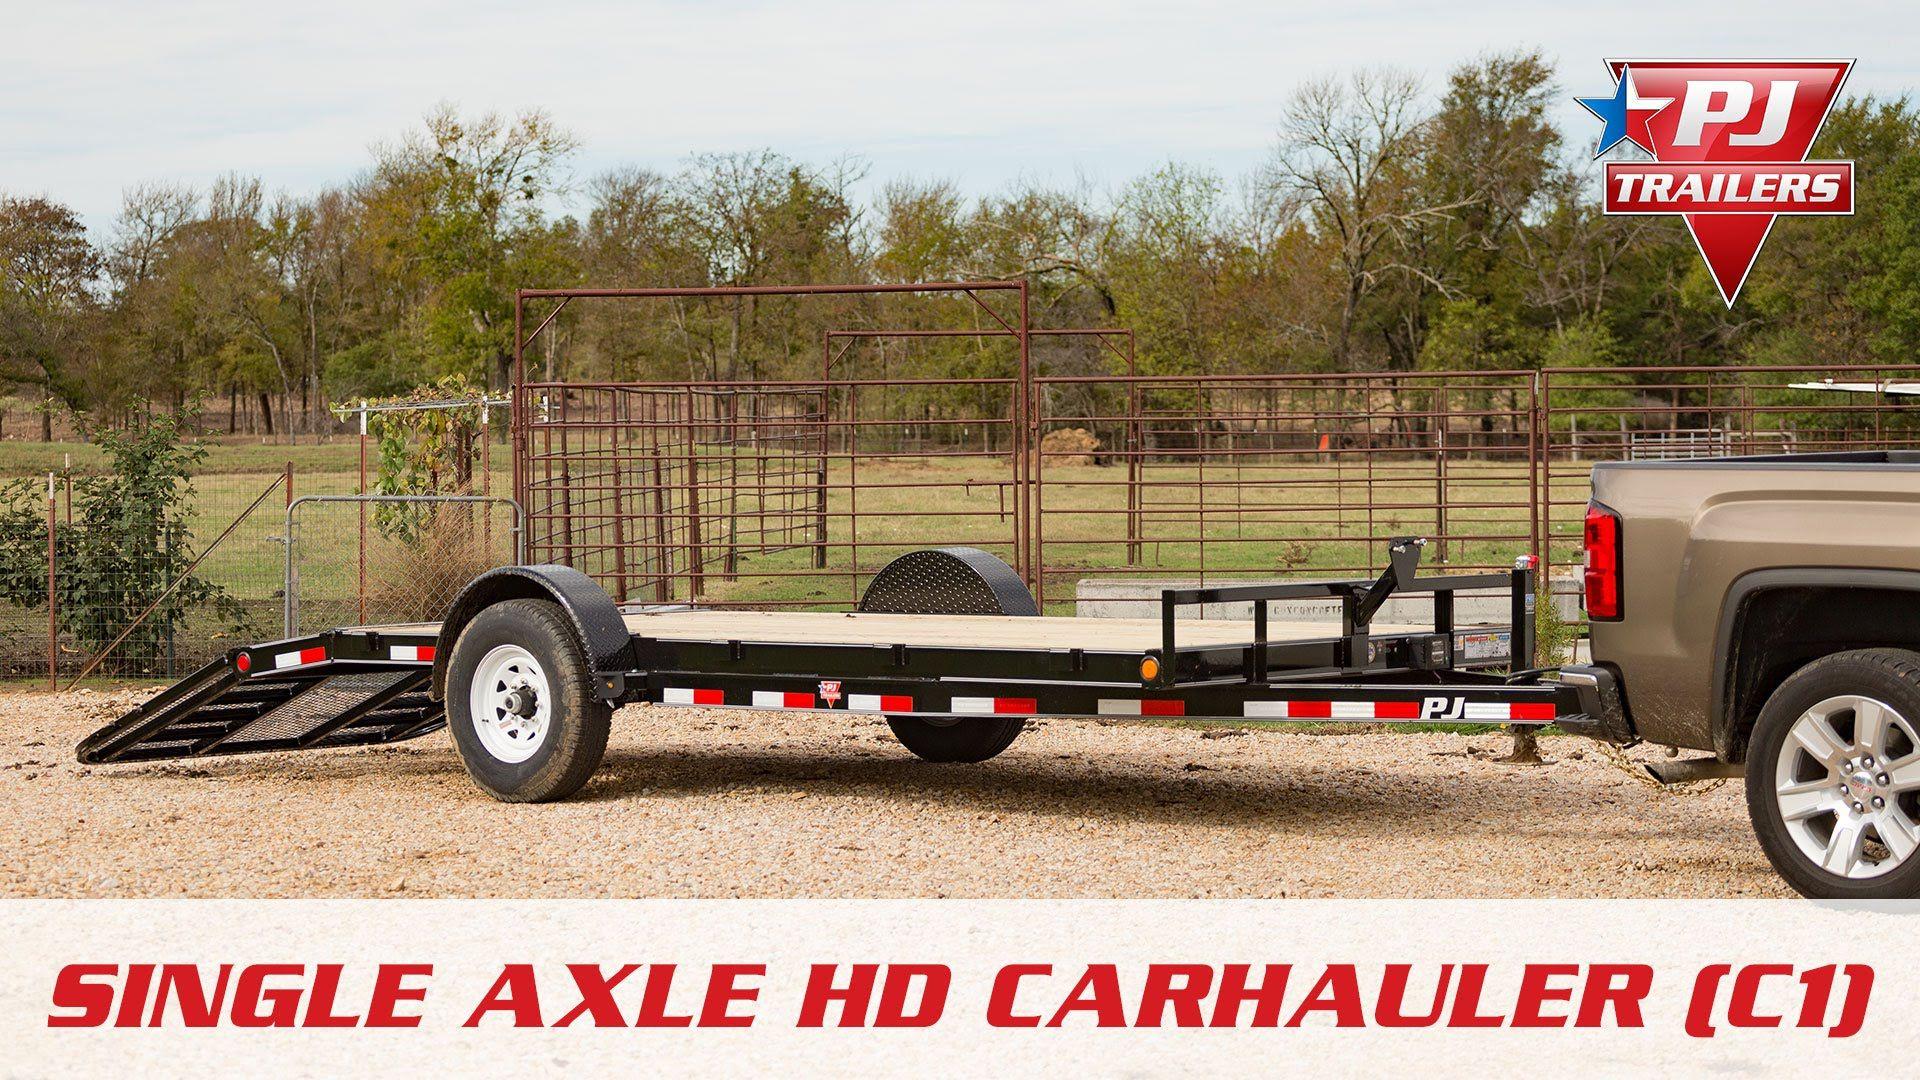 C1 Single Axle Hd Car Hauler Walk Around Pj Trailers Pj Trailers Axle Equipment Trailers